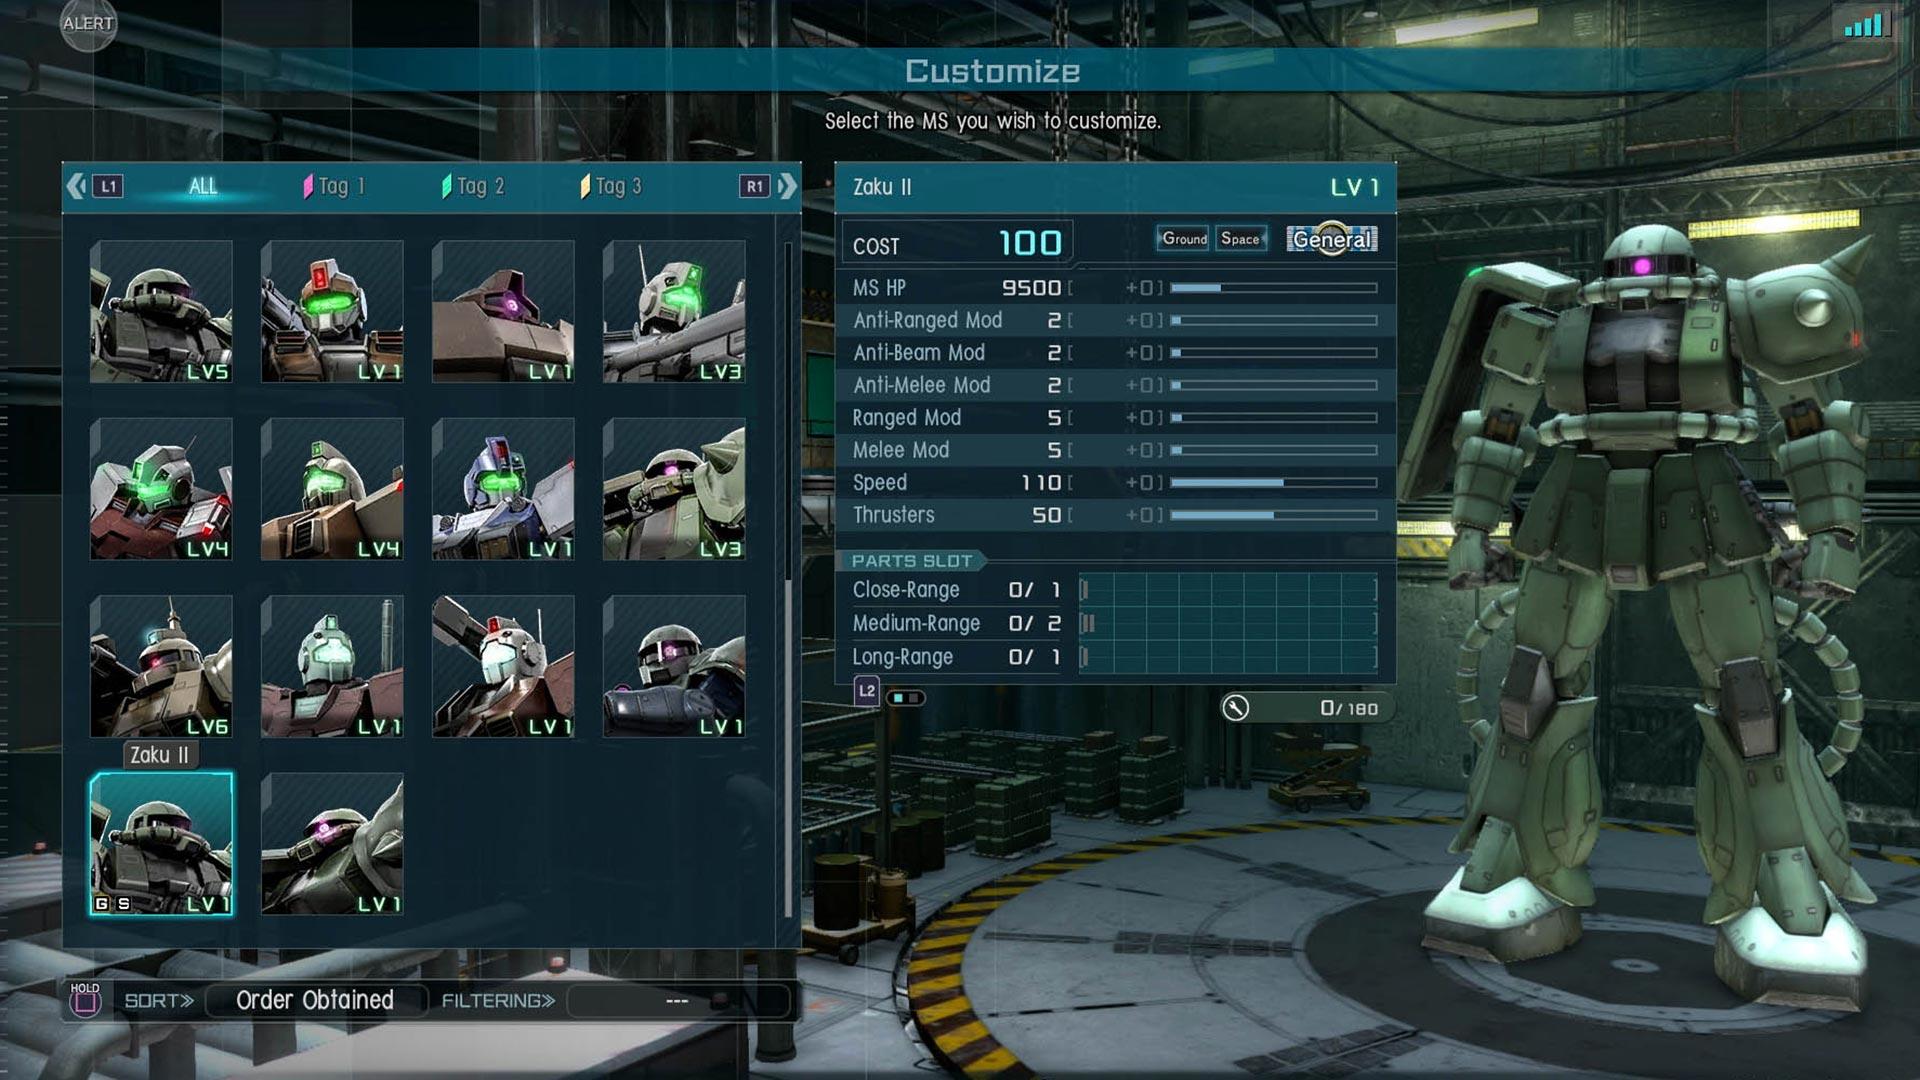 MOBILE SUIT GUNDAM BATTLE OPERATION 2 скриншот 1